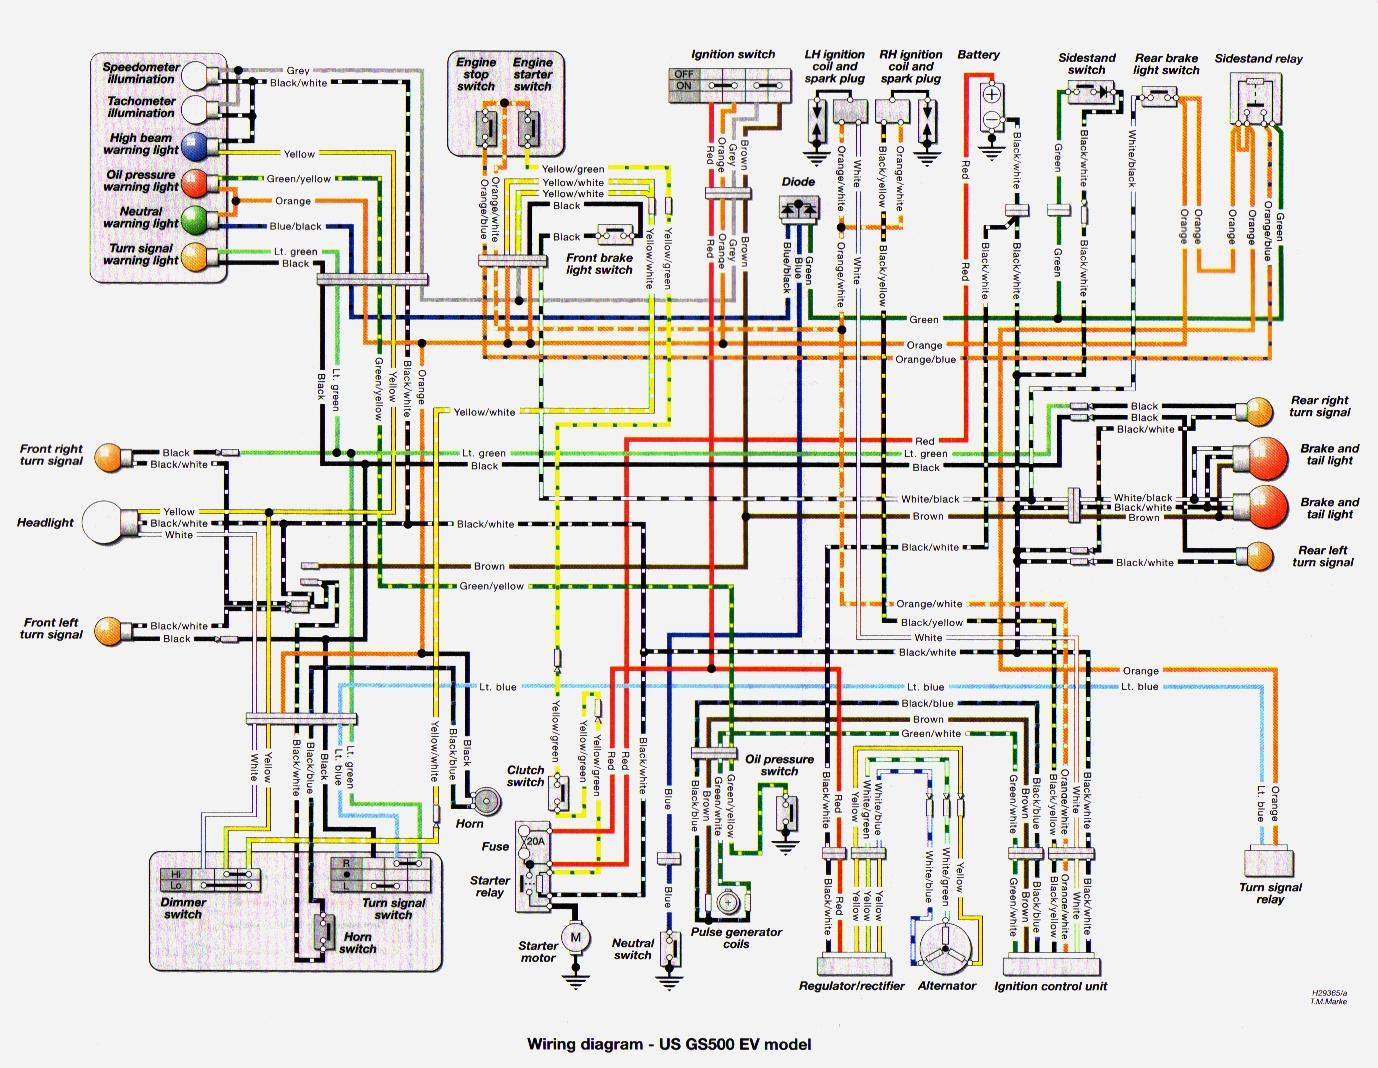 2005 gs500 wiring diagram